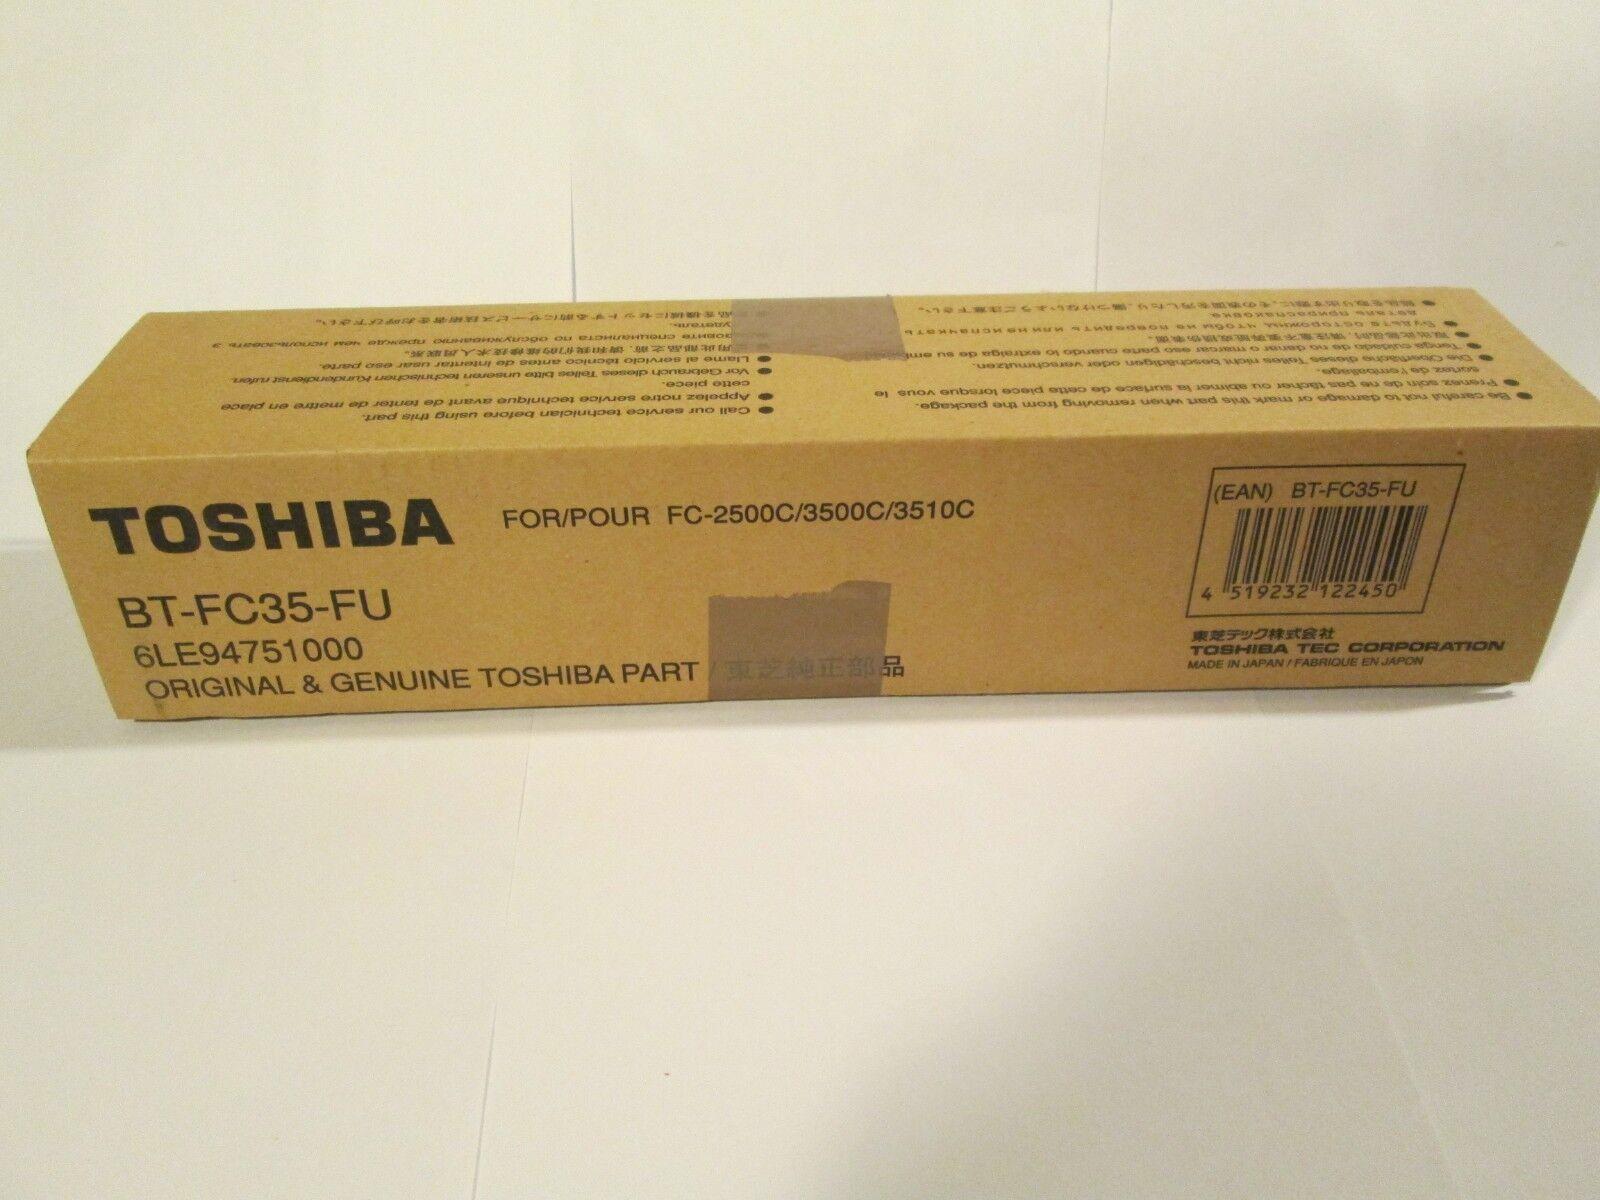 Genuine Toshiba BT-FC35-FU BTFC35FU  fuser belt part number 6LE94751000